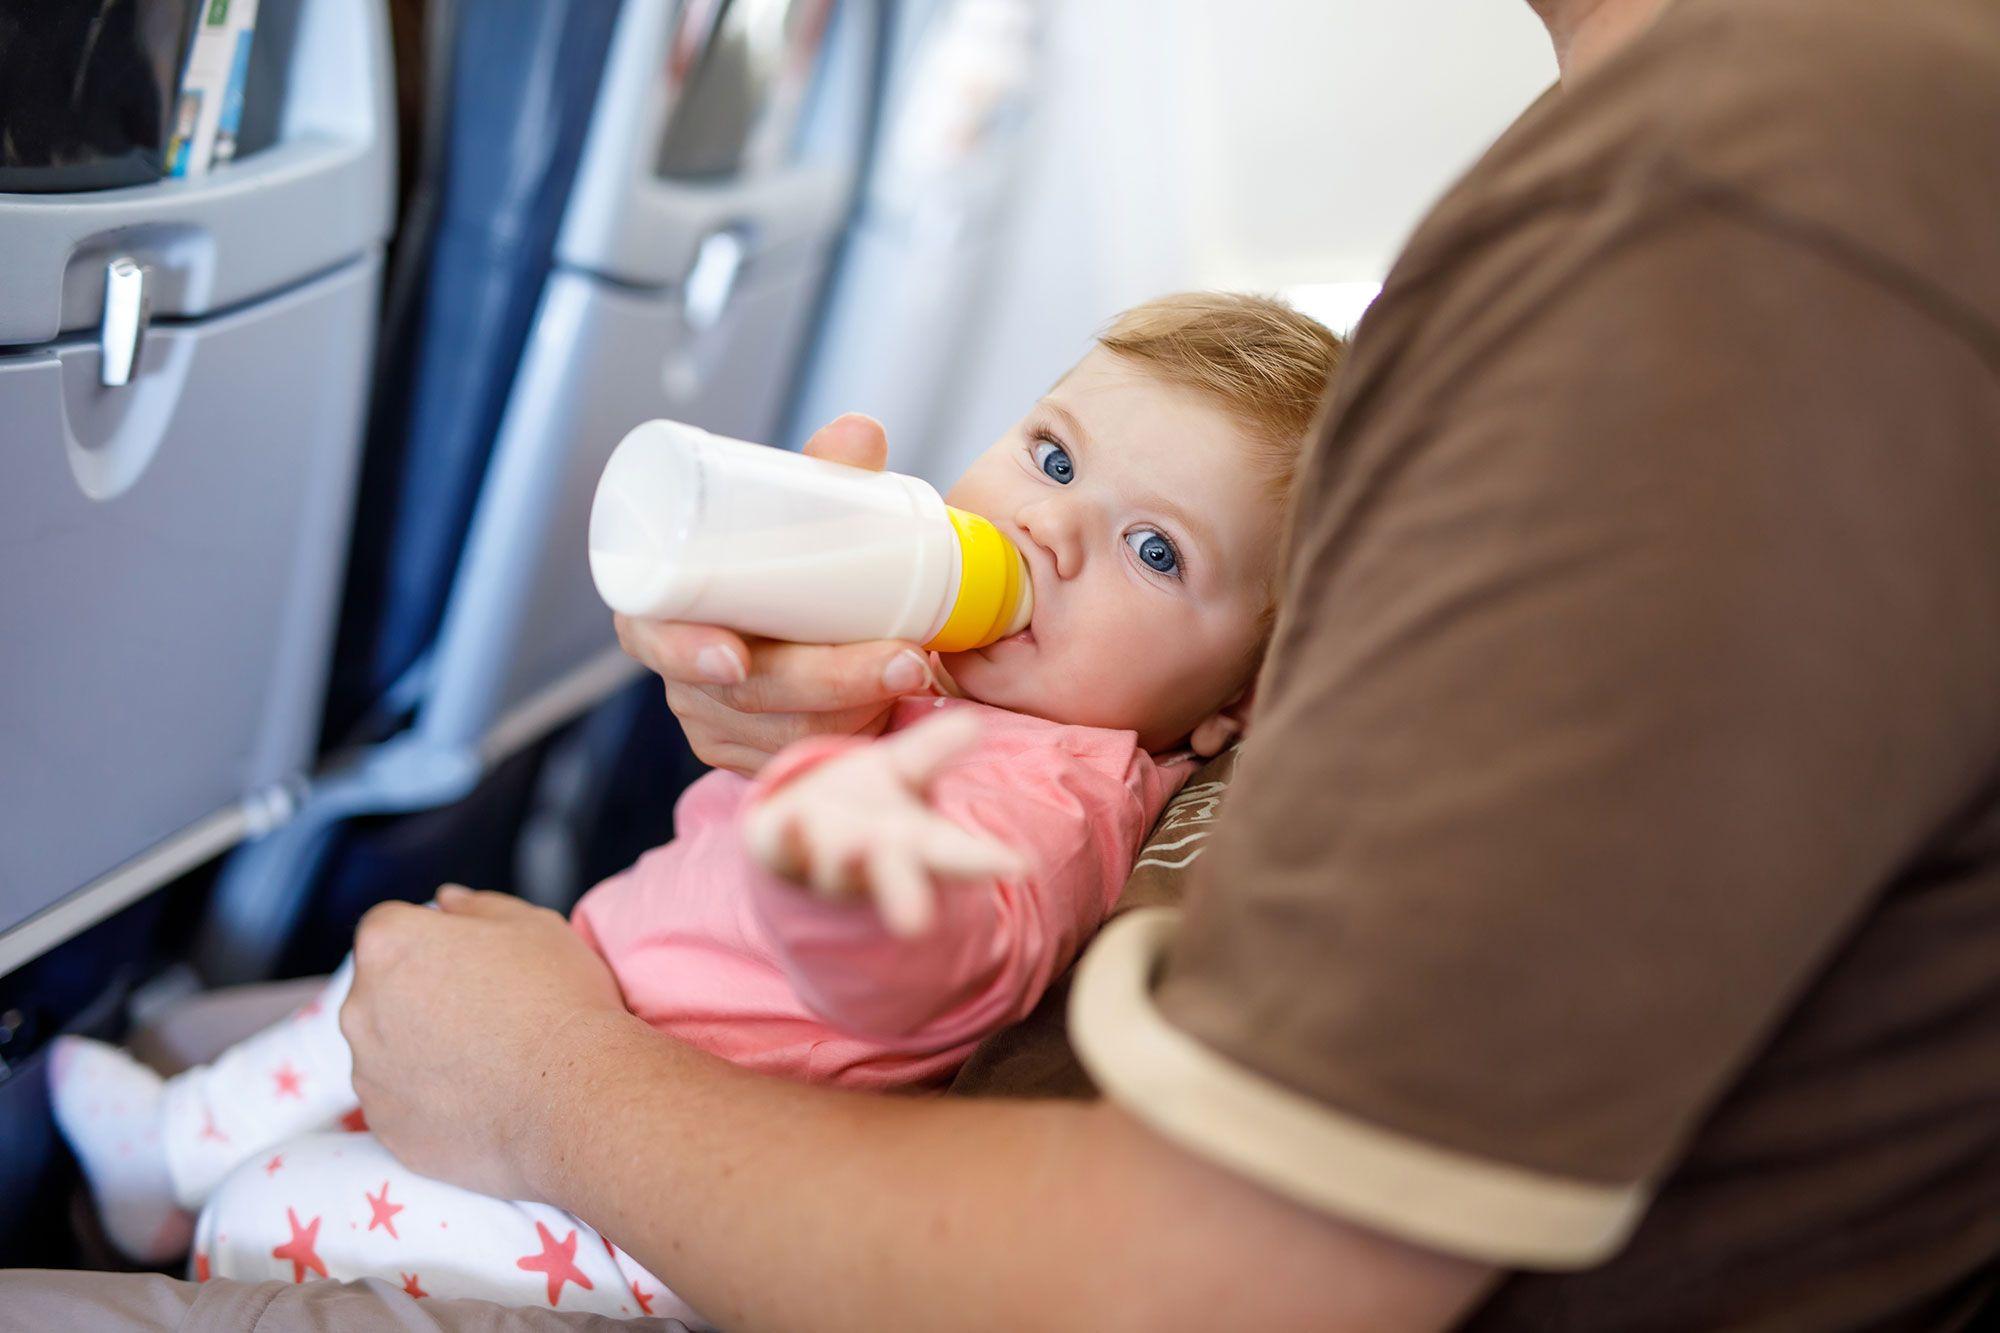 viajar niños bebés avión